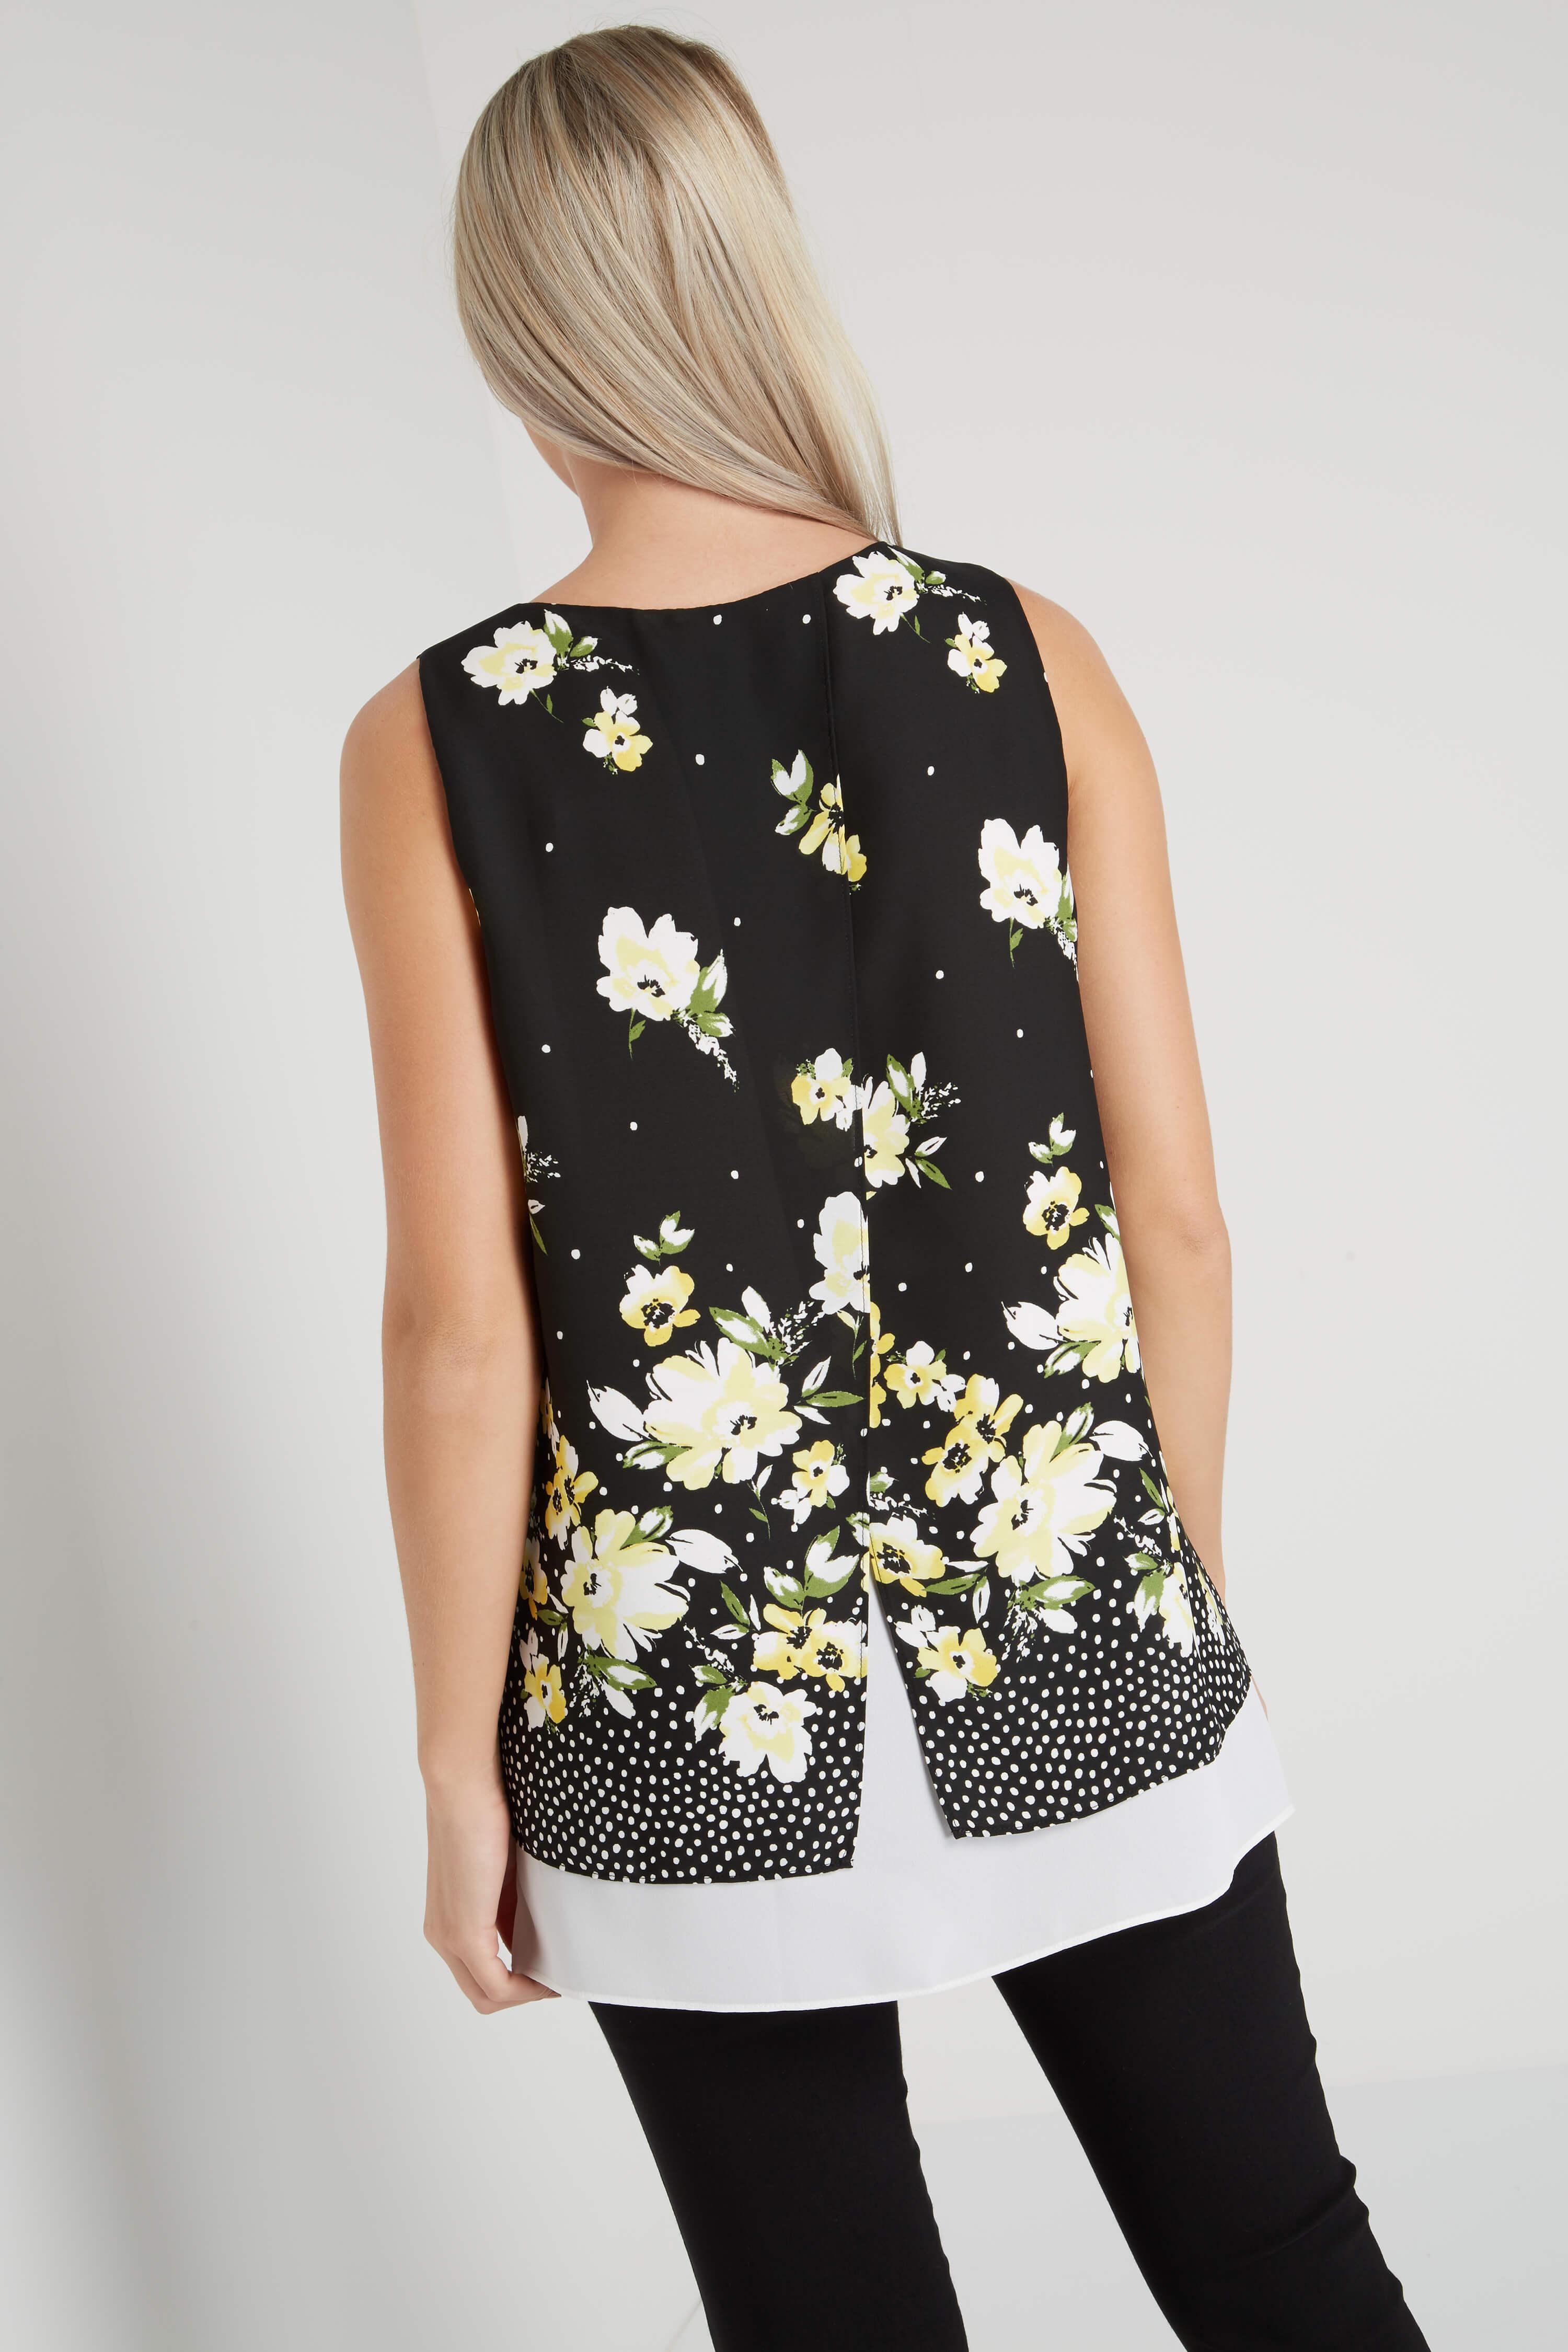 Roman Originals Women/'s Black Floral Print Overlay Top Sizes 10-20